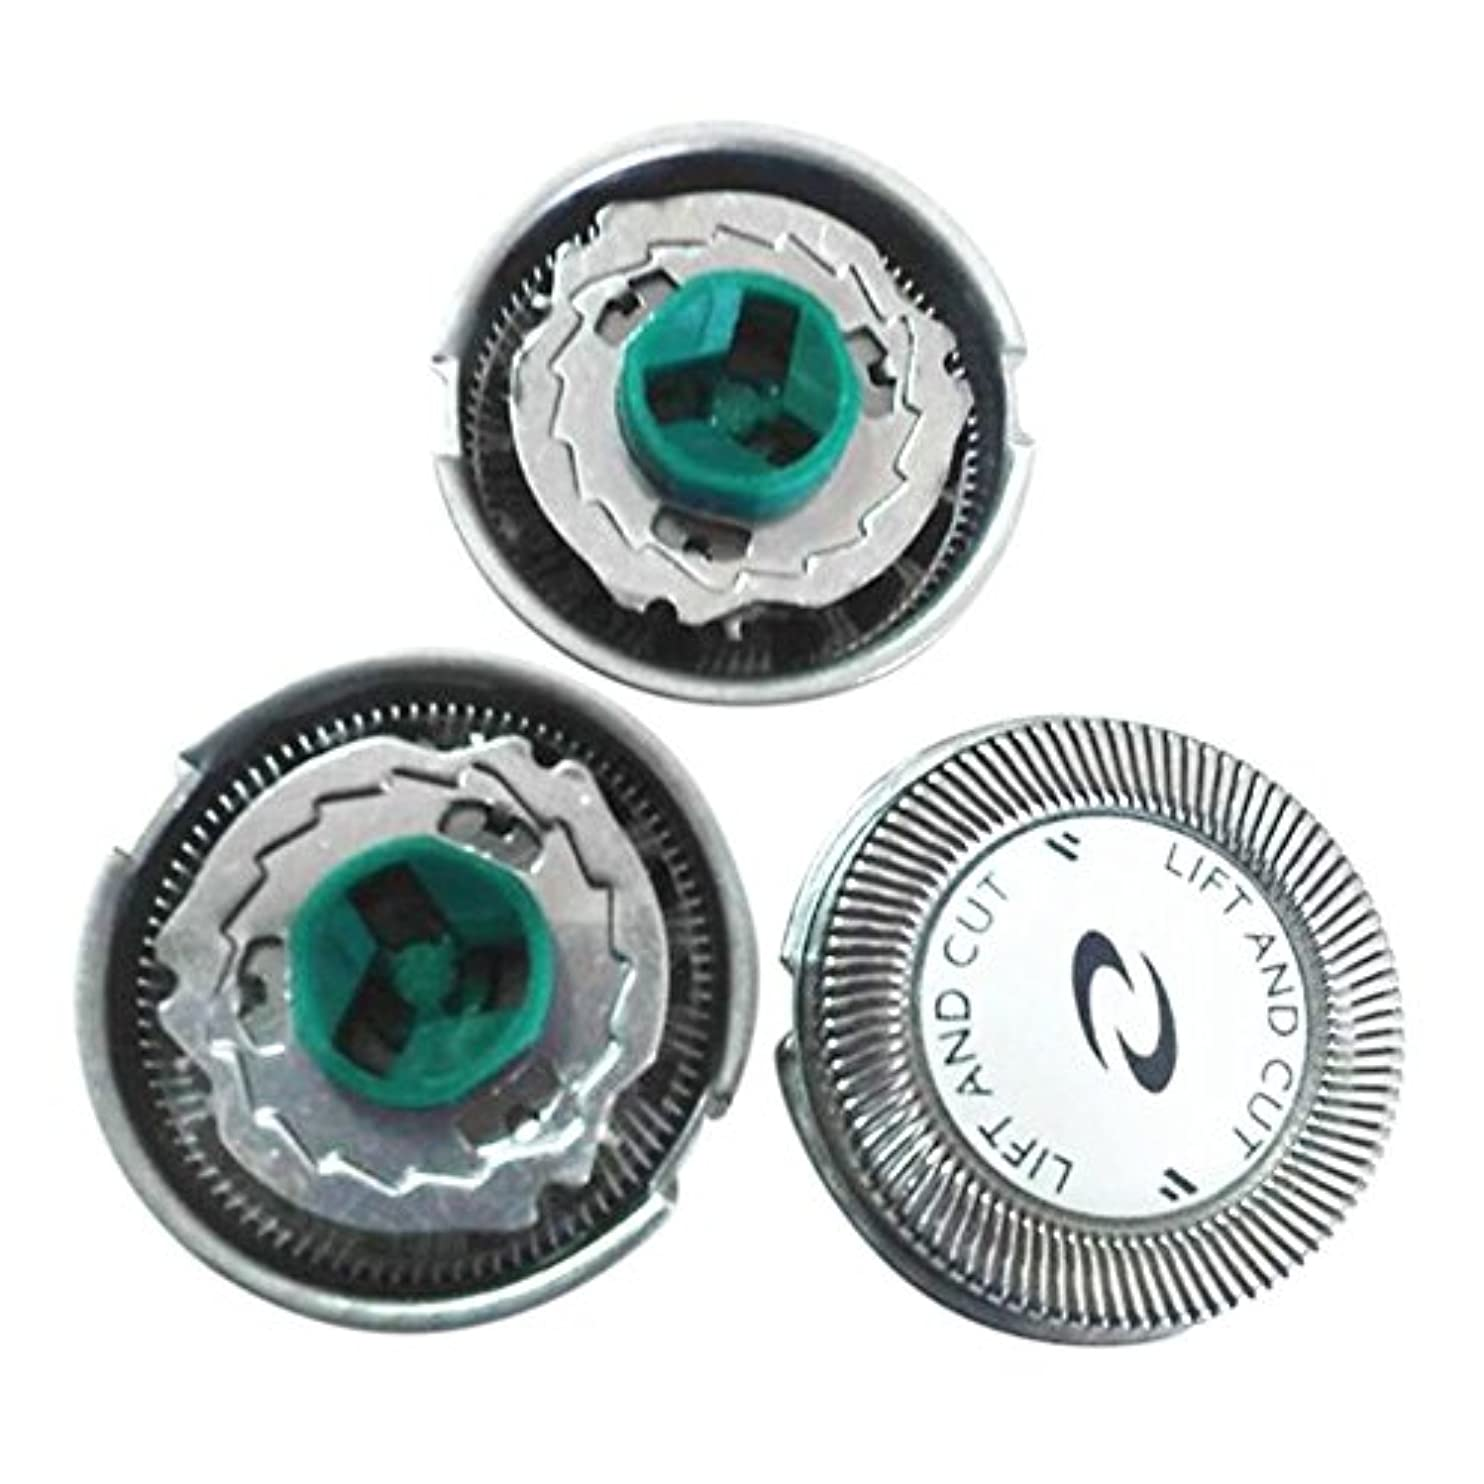 HZjundasi 3x Replacement シェーバーヘッドフォイル+Cutters for Philip HQ5705/5710 PT720 AT750